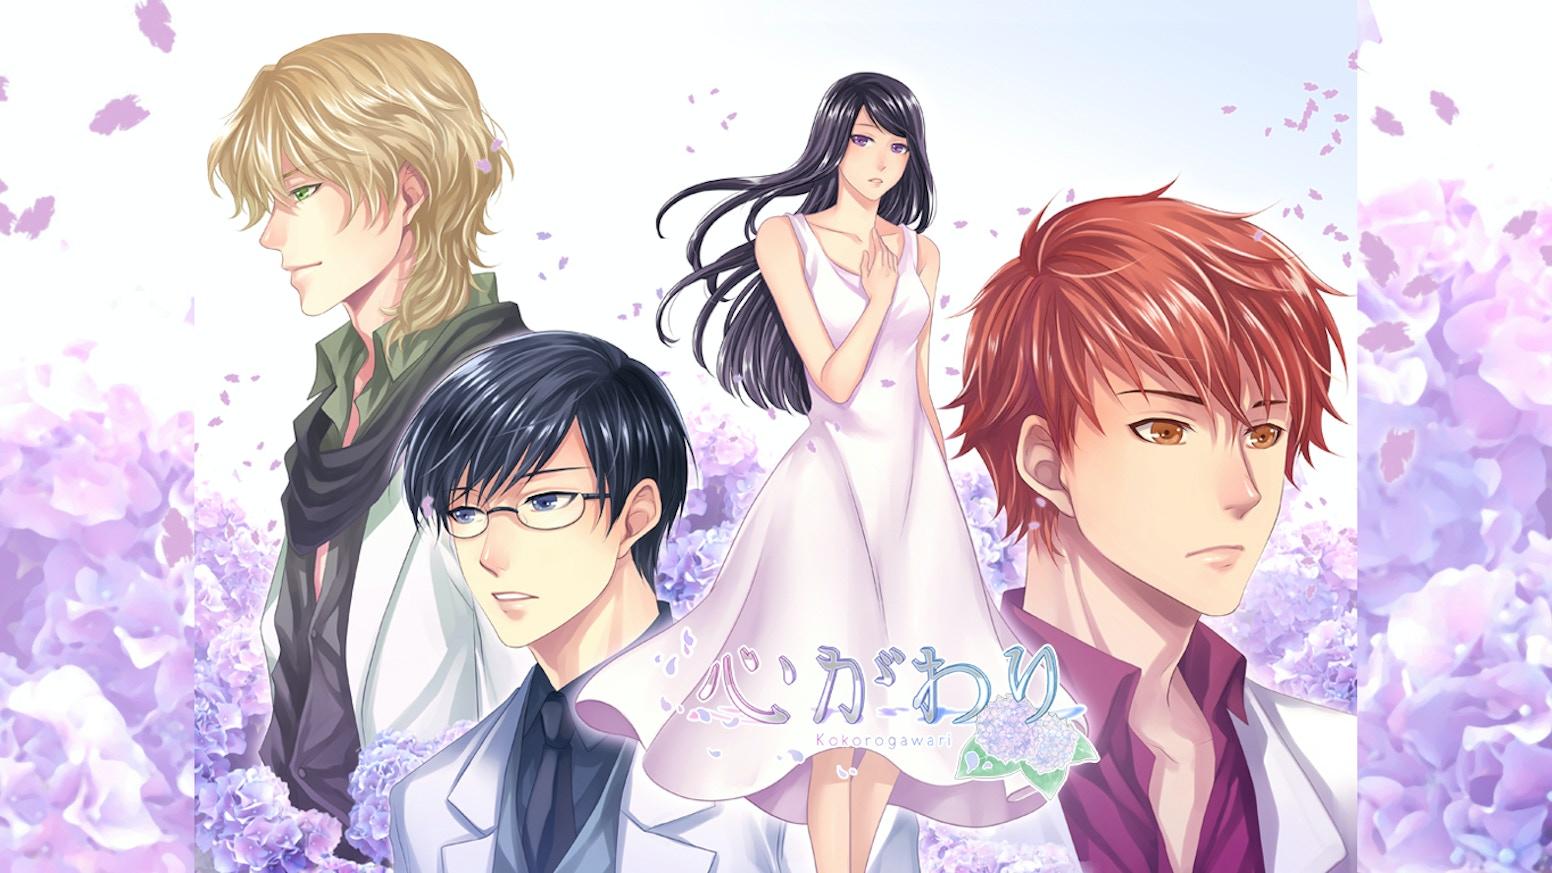 Kokorogawari Is An Otome GxB Romance Visual Novel Set In Modern Day Japan